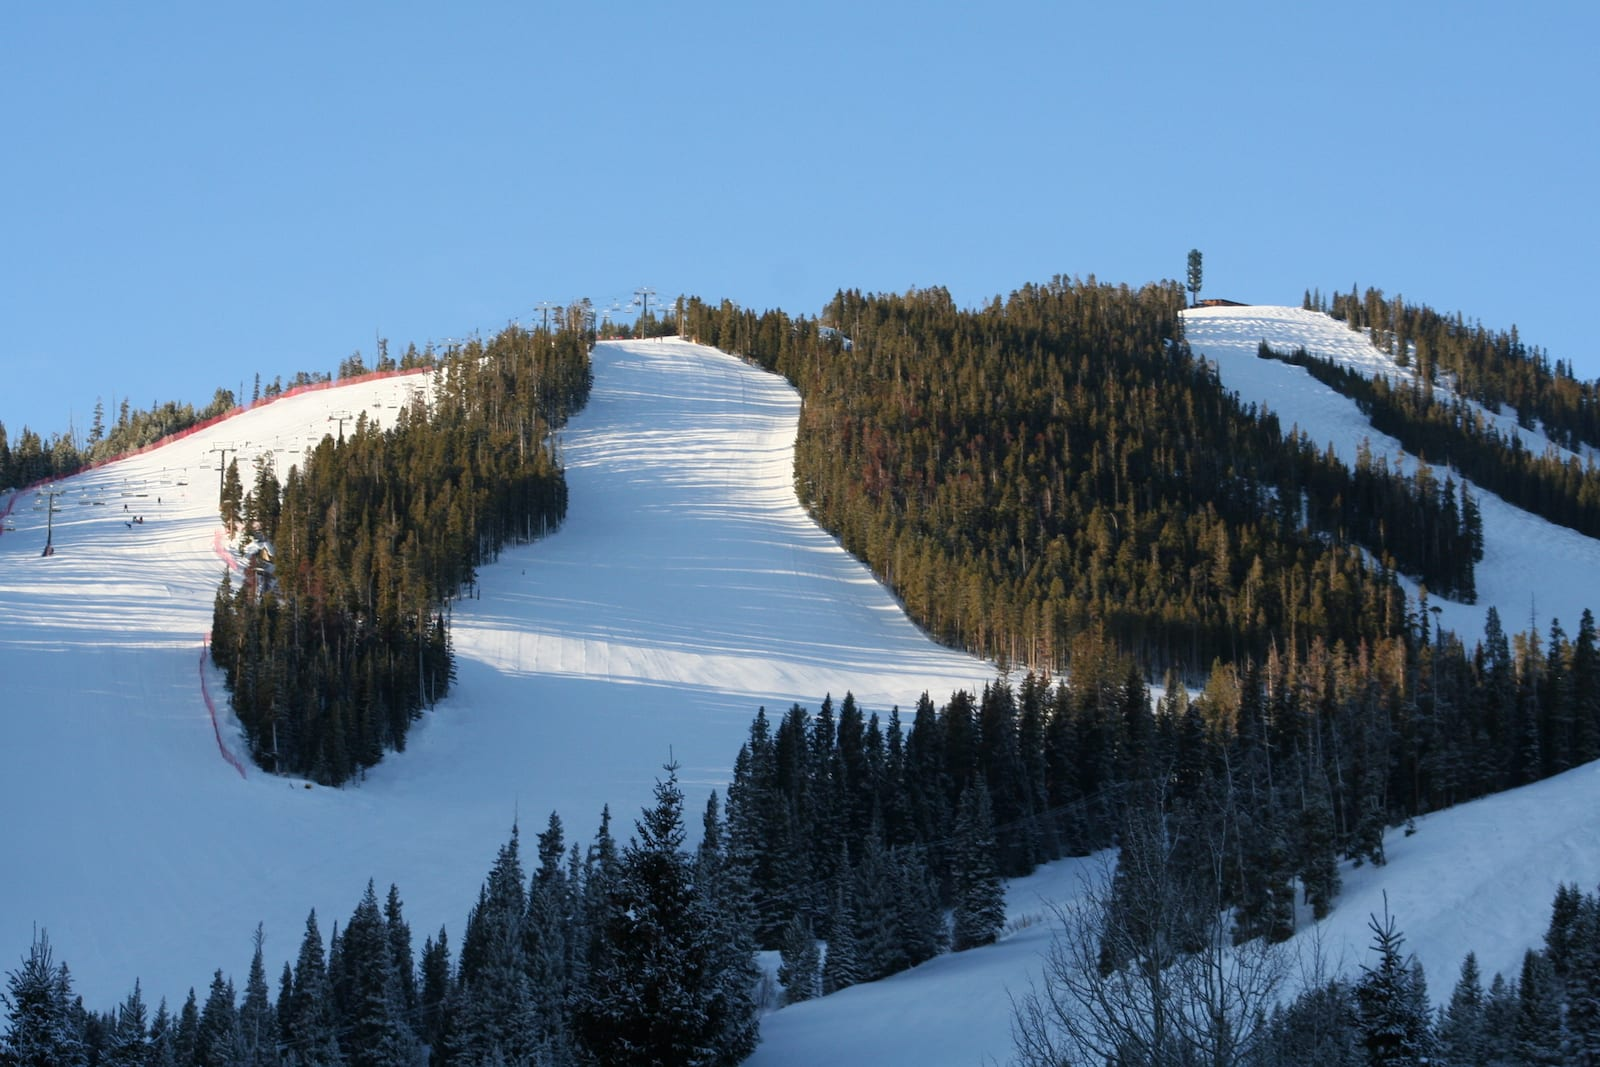 Winter Park Ski Resort Trails